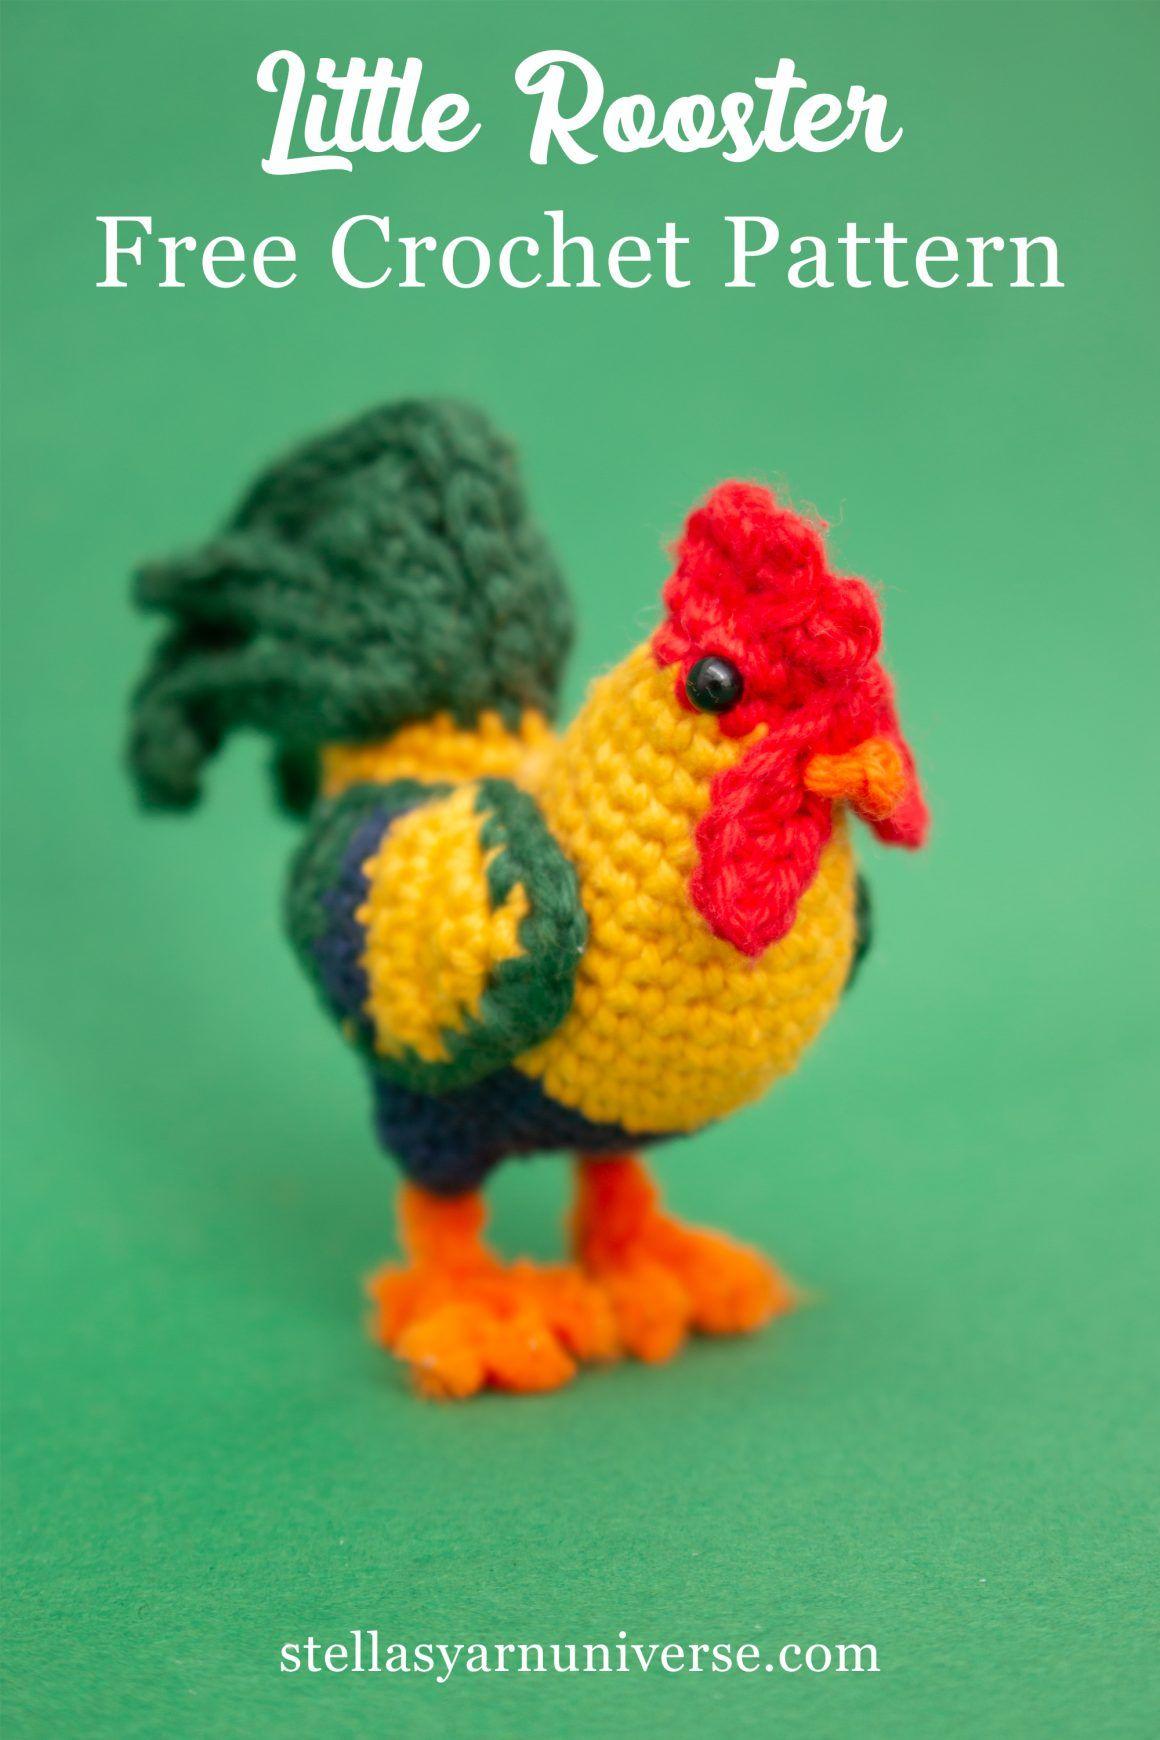 Amigurumi Rooster - Free Crochet Pattern - Stella's Yarn Universe